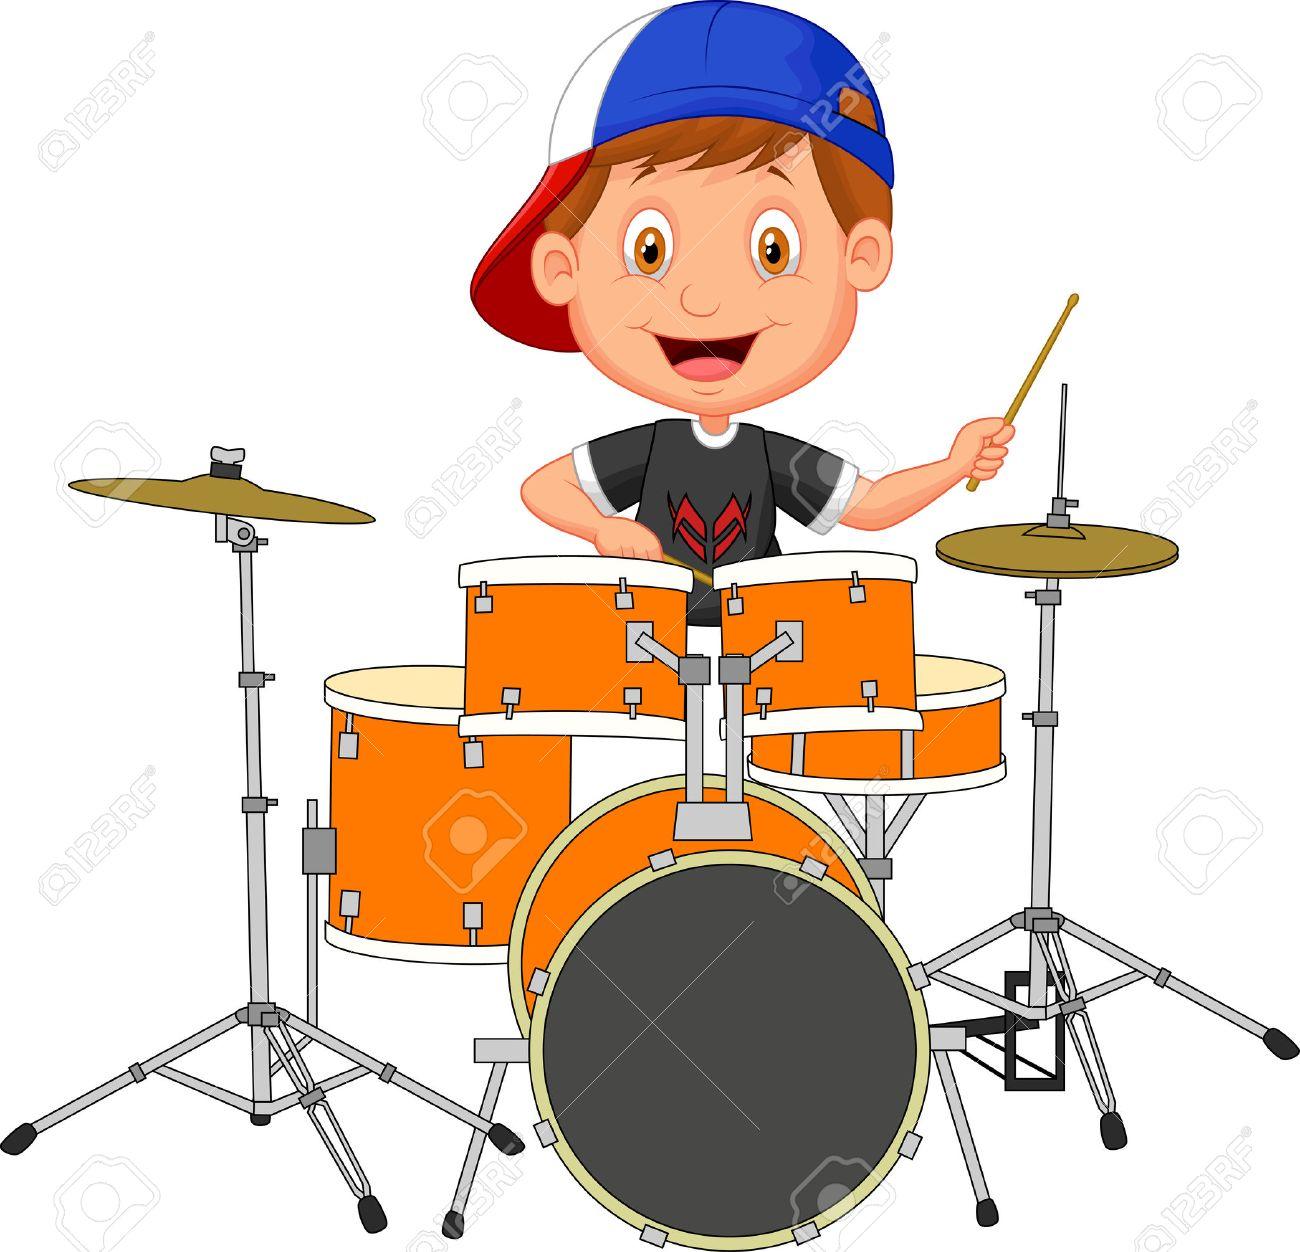 Little boy cartoon playing drum.